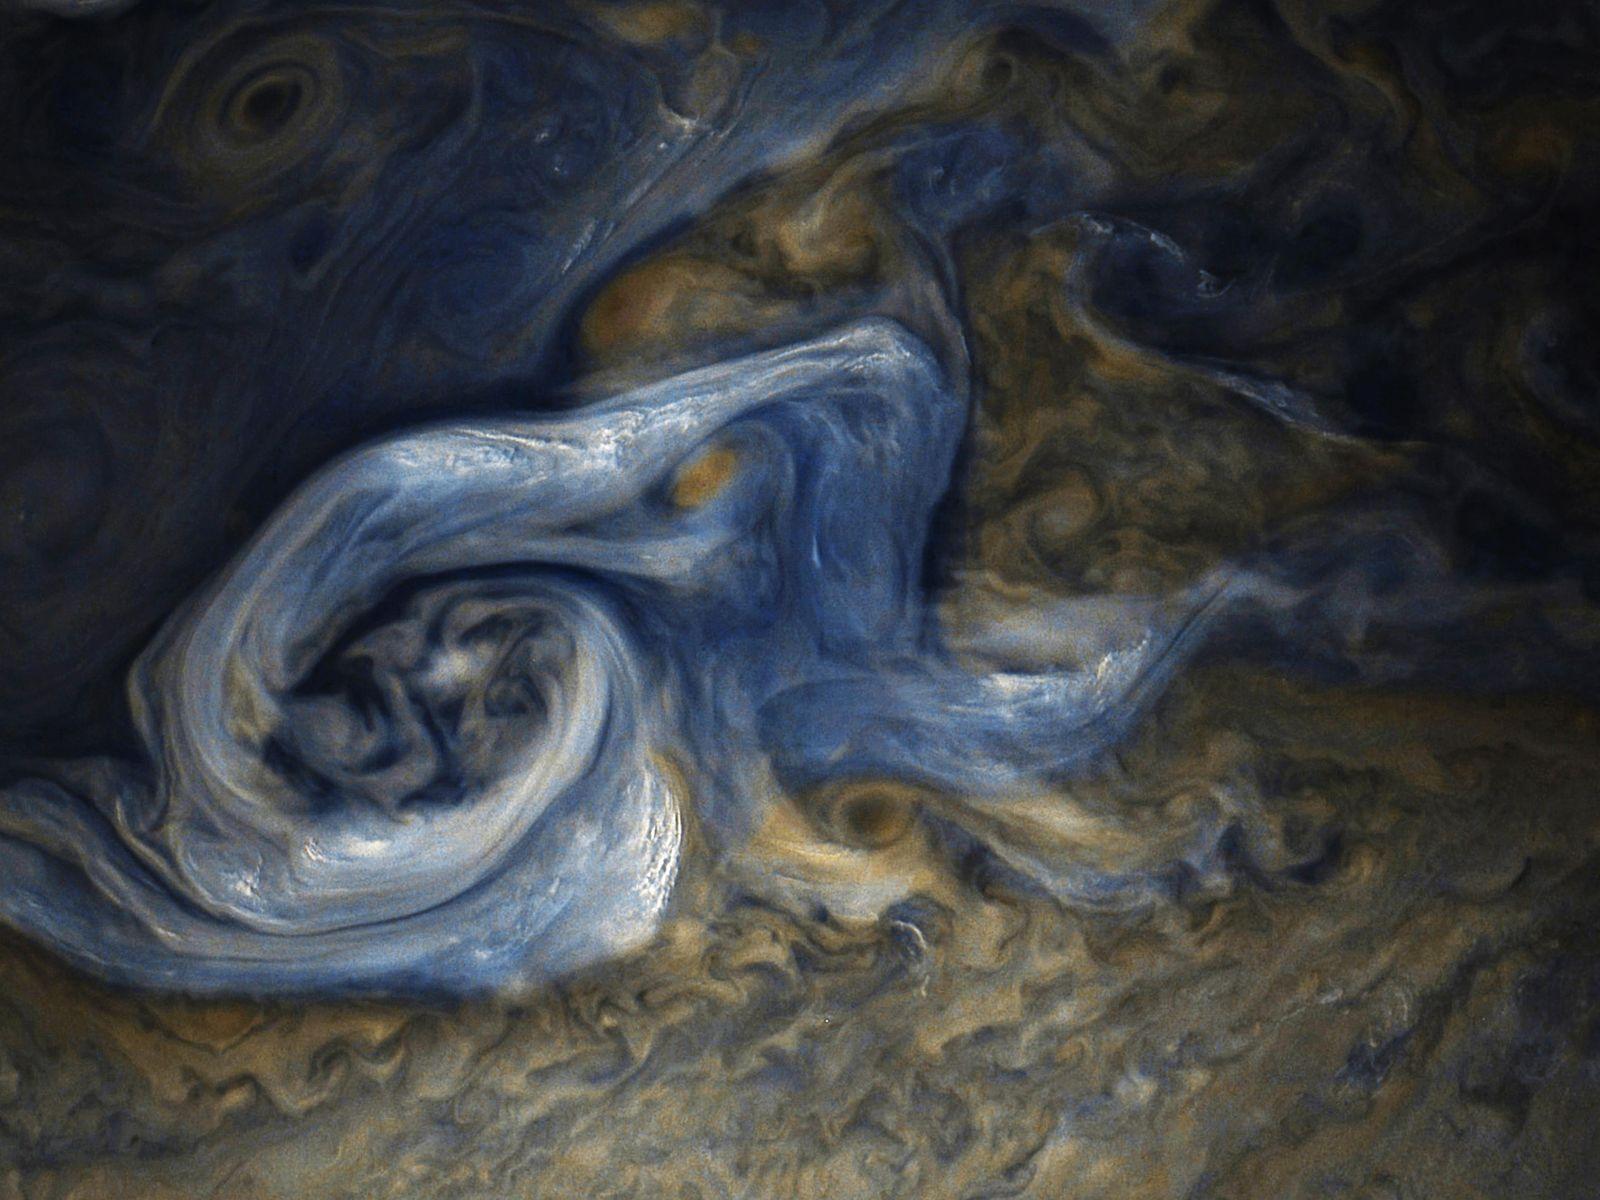 Jovian Tempest. Image credit: NASA/JPL/Caltech SwRI/MSSS